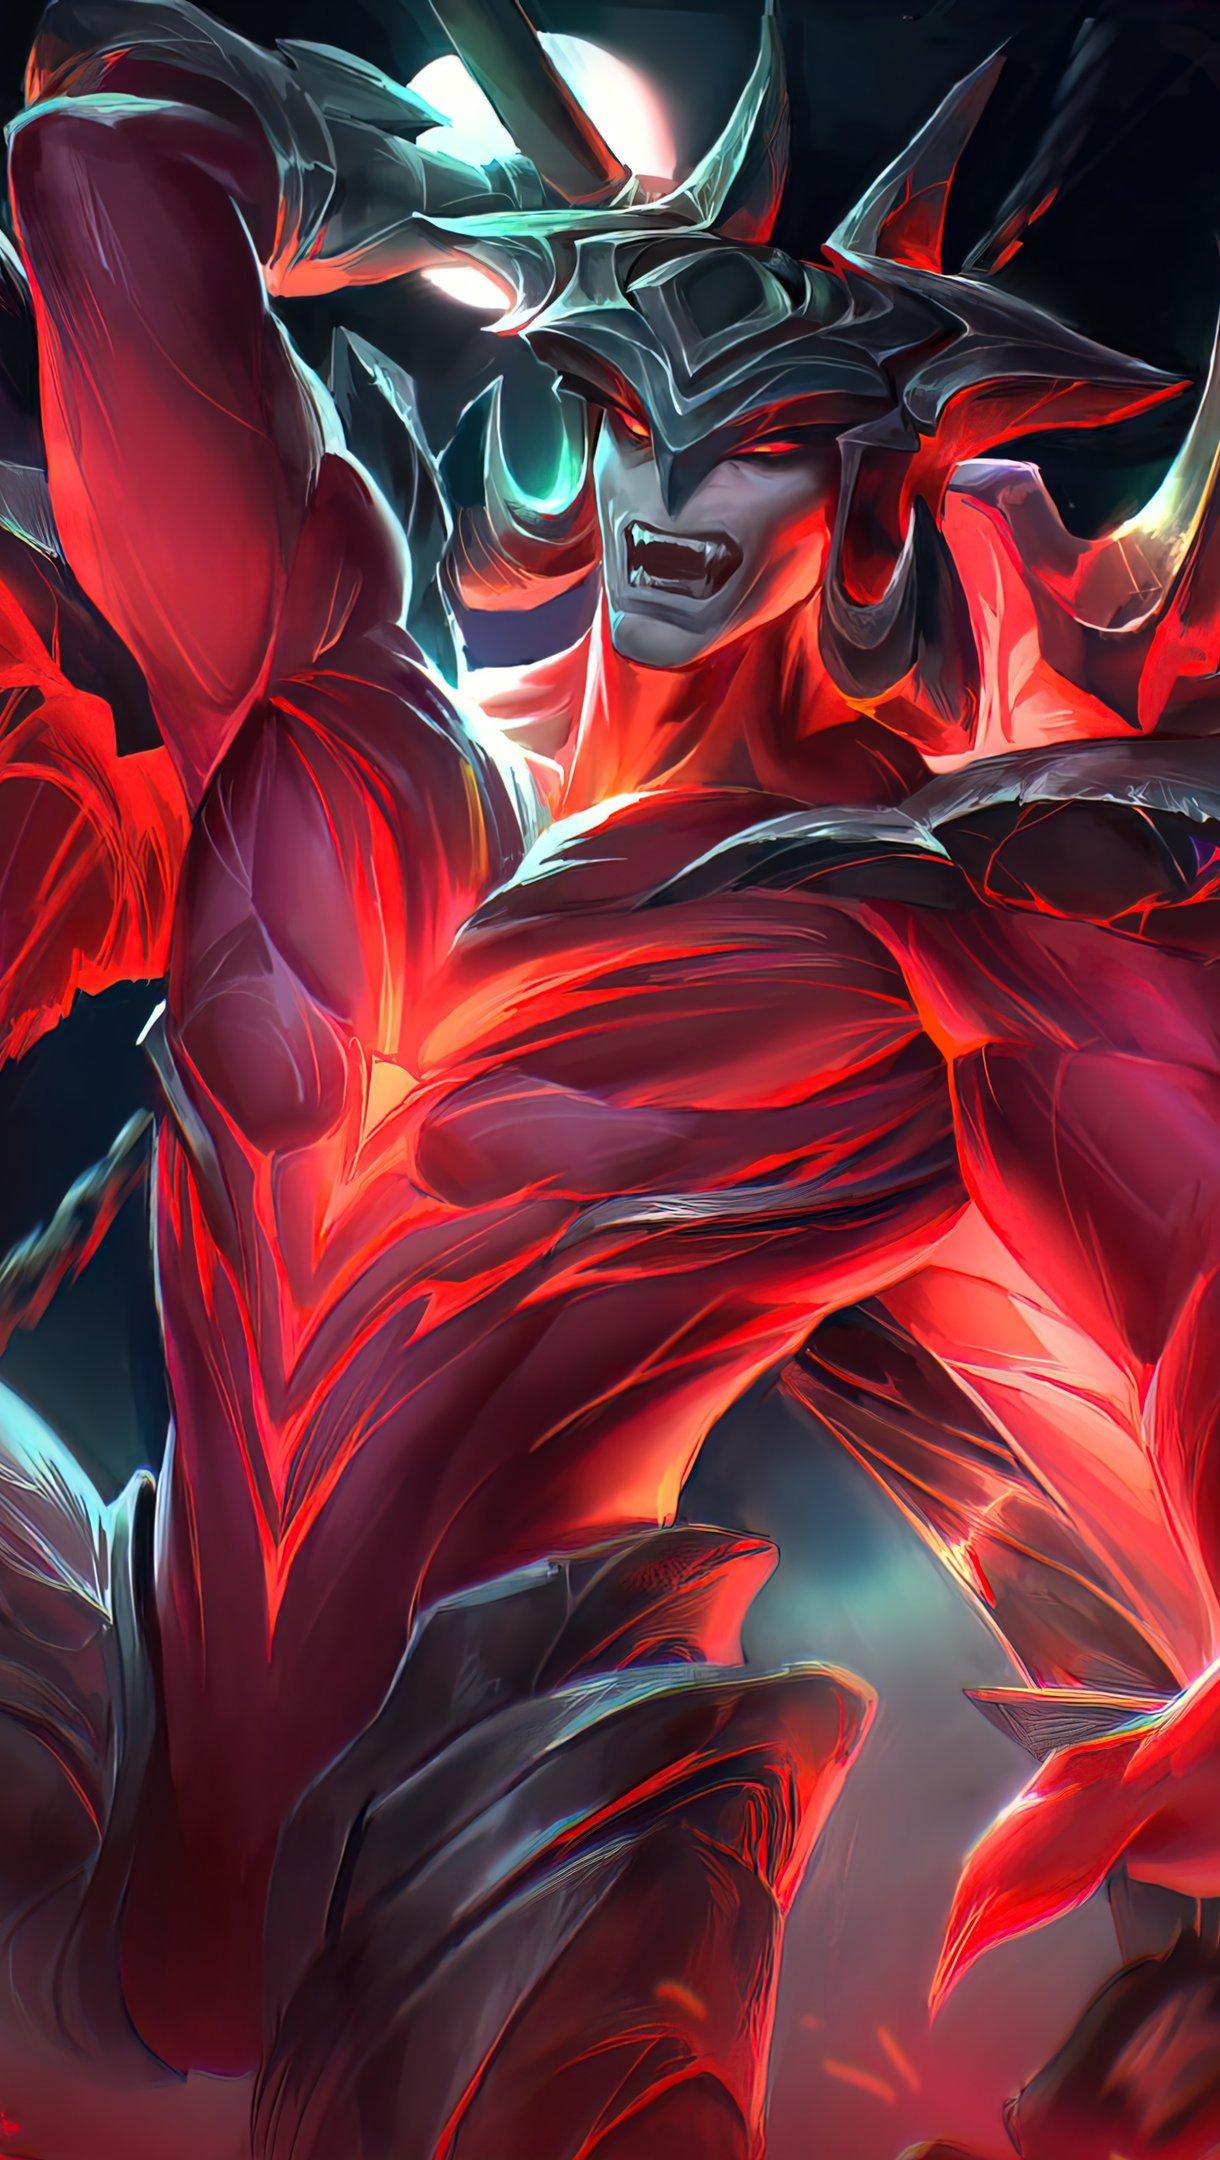 Wallpaper Aatrox League of Legends Vertical